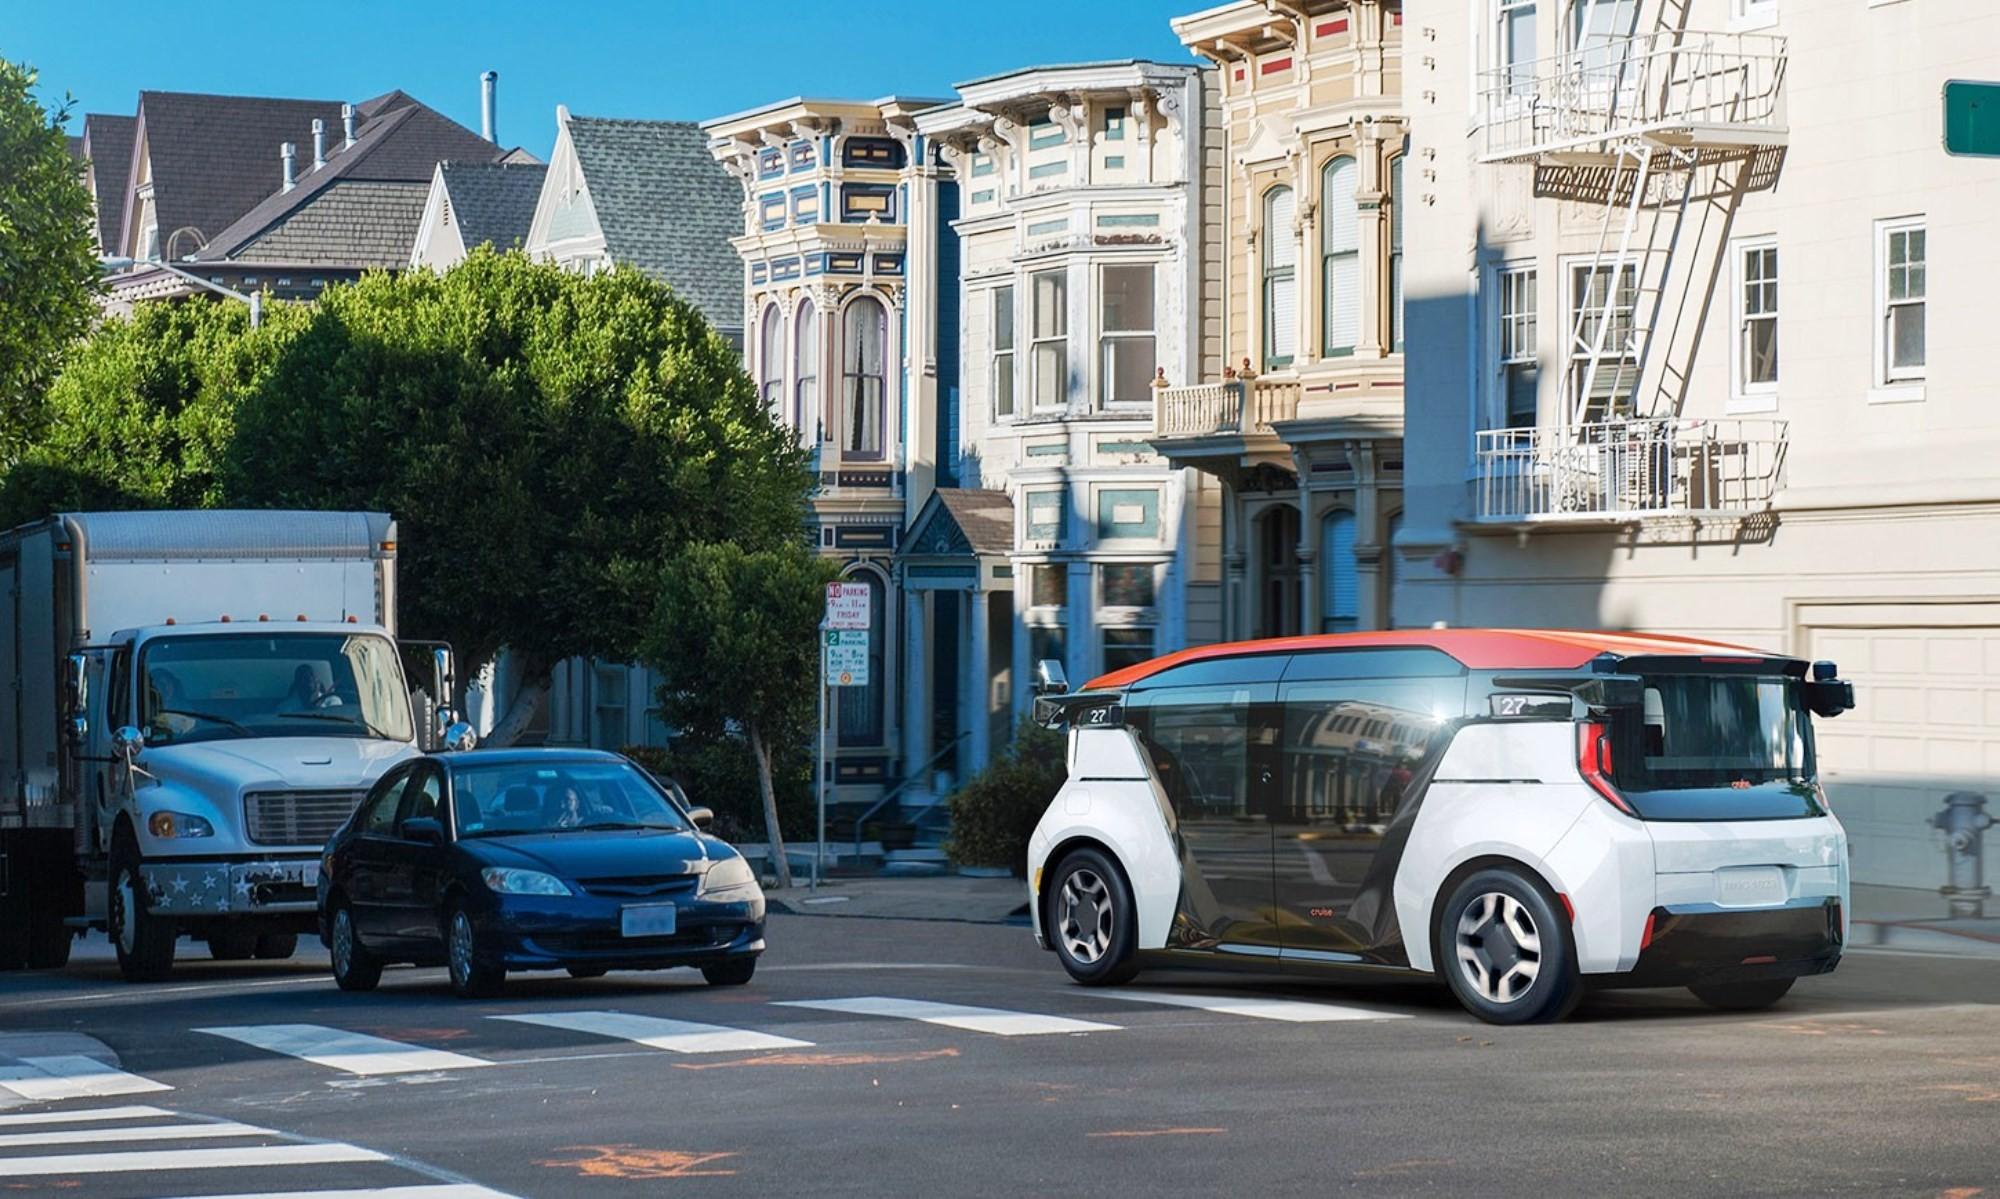 Driverless GM Cruise Origin on road